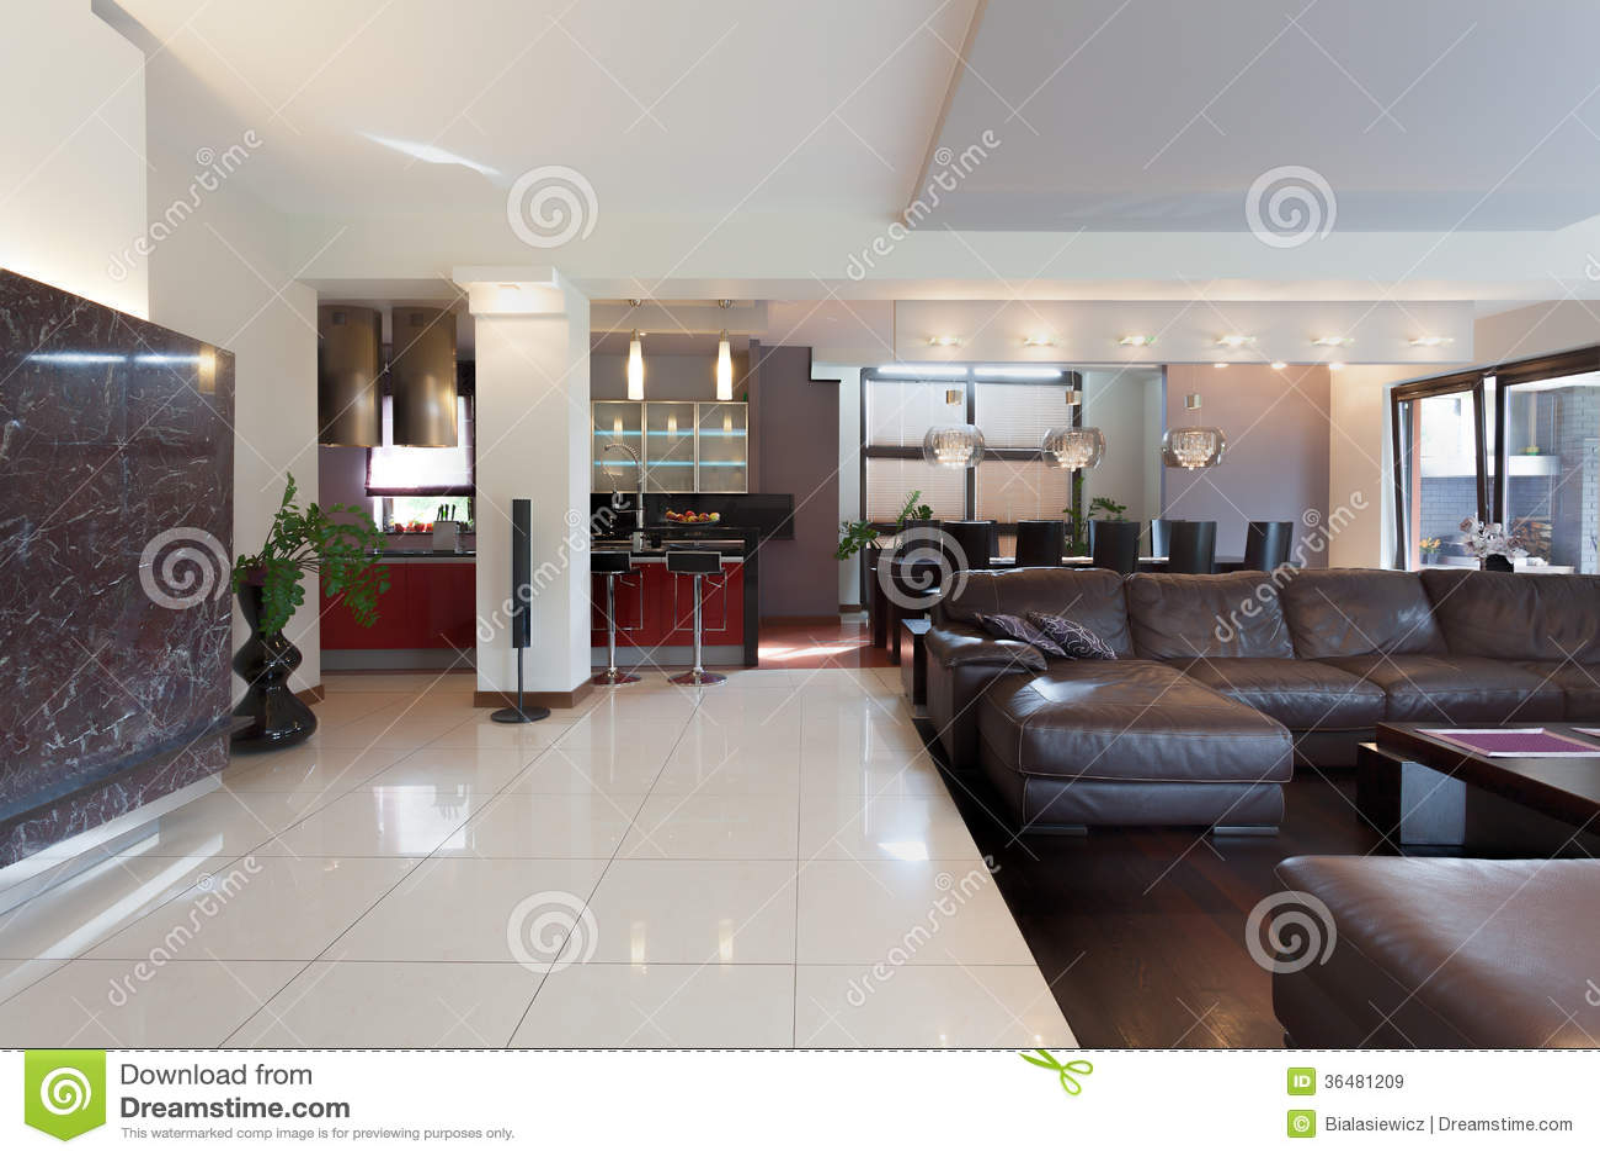 Cucina salone e sala da pranzo immagini stock libere da - Sala e cucina ...